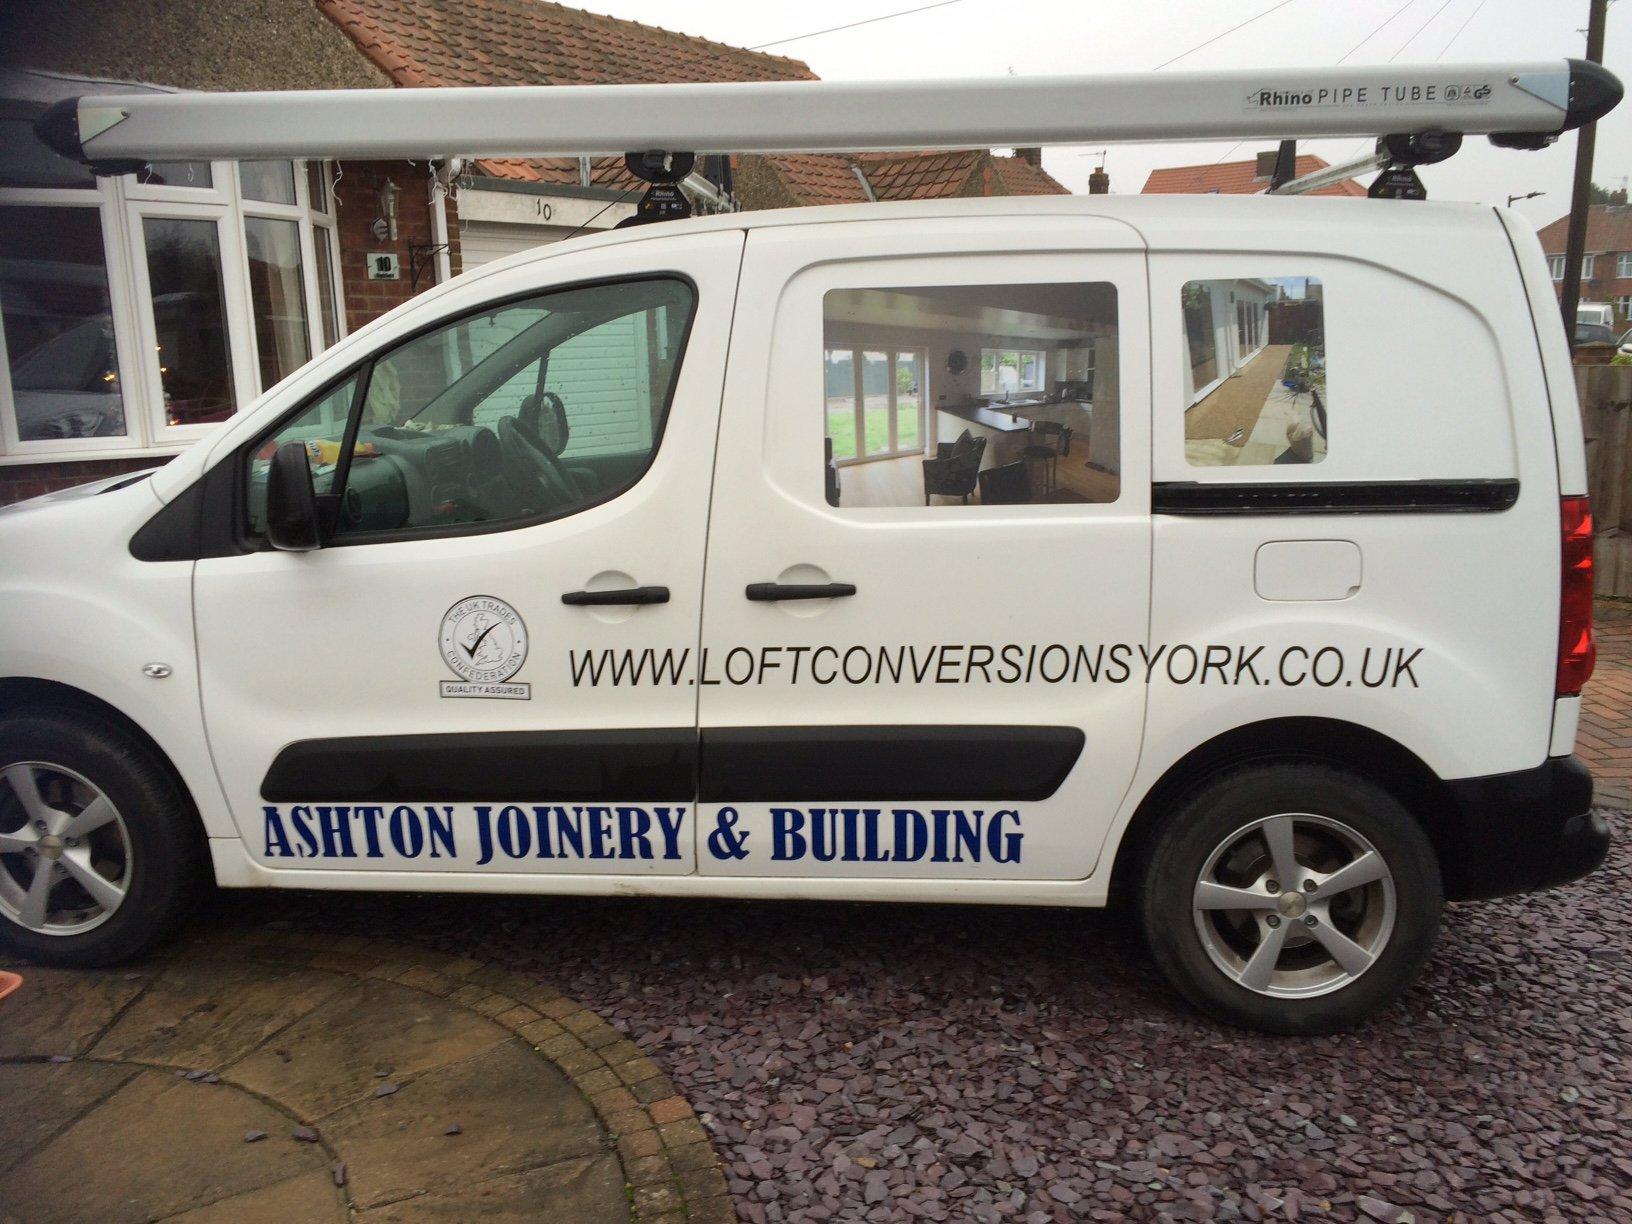 Loft Conversions York